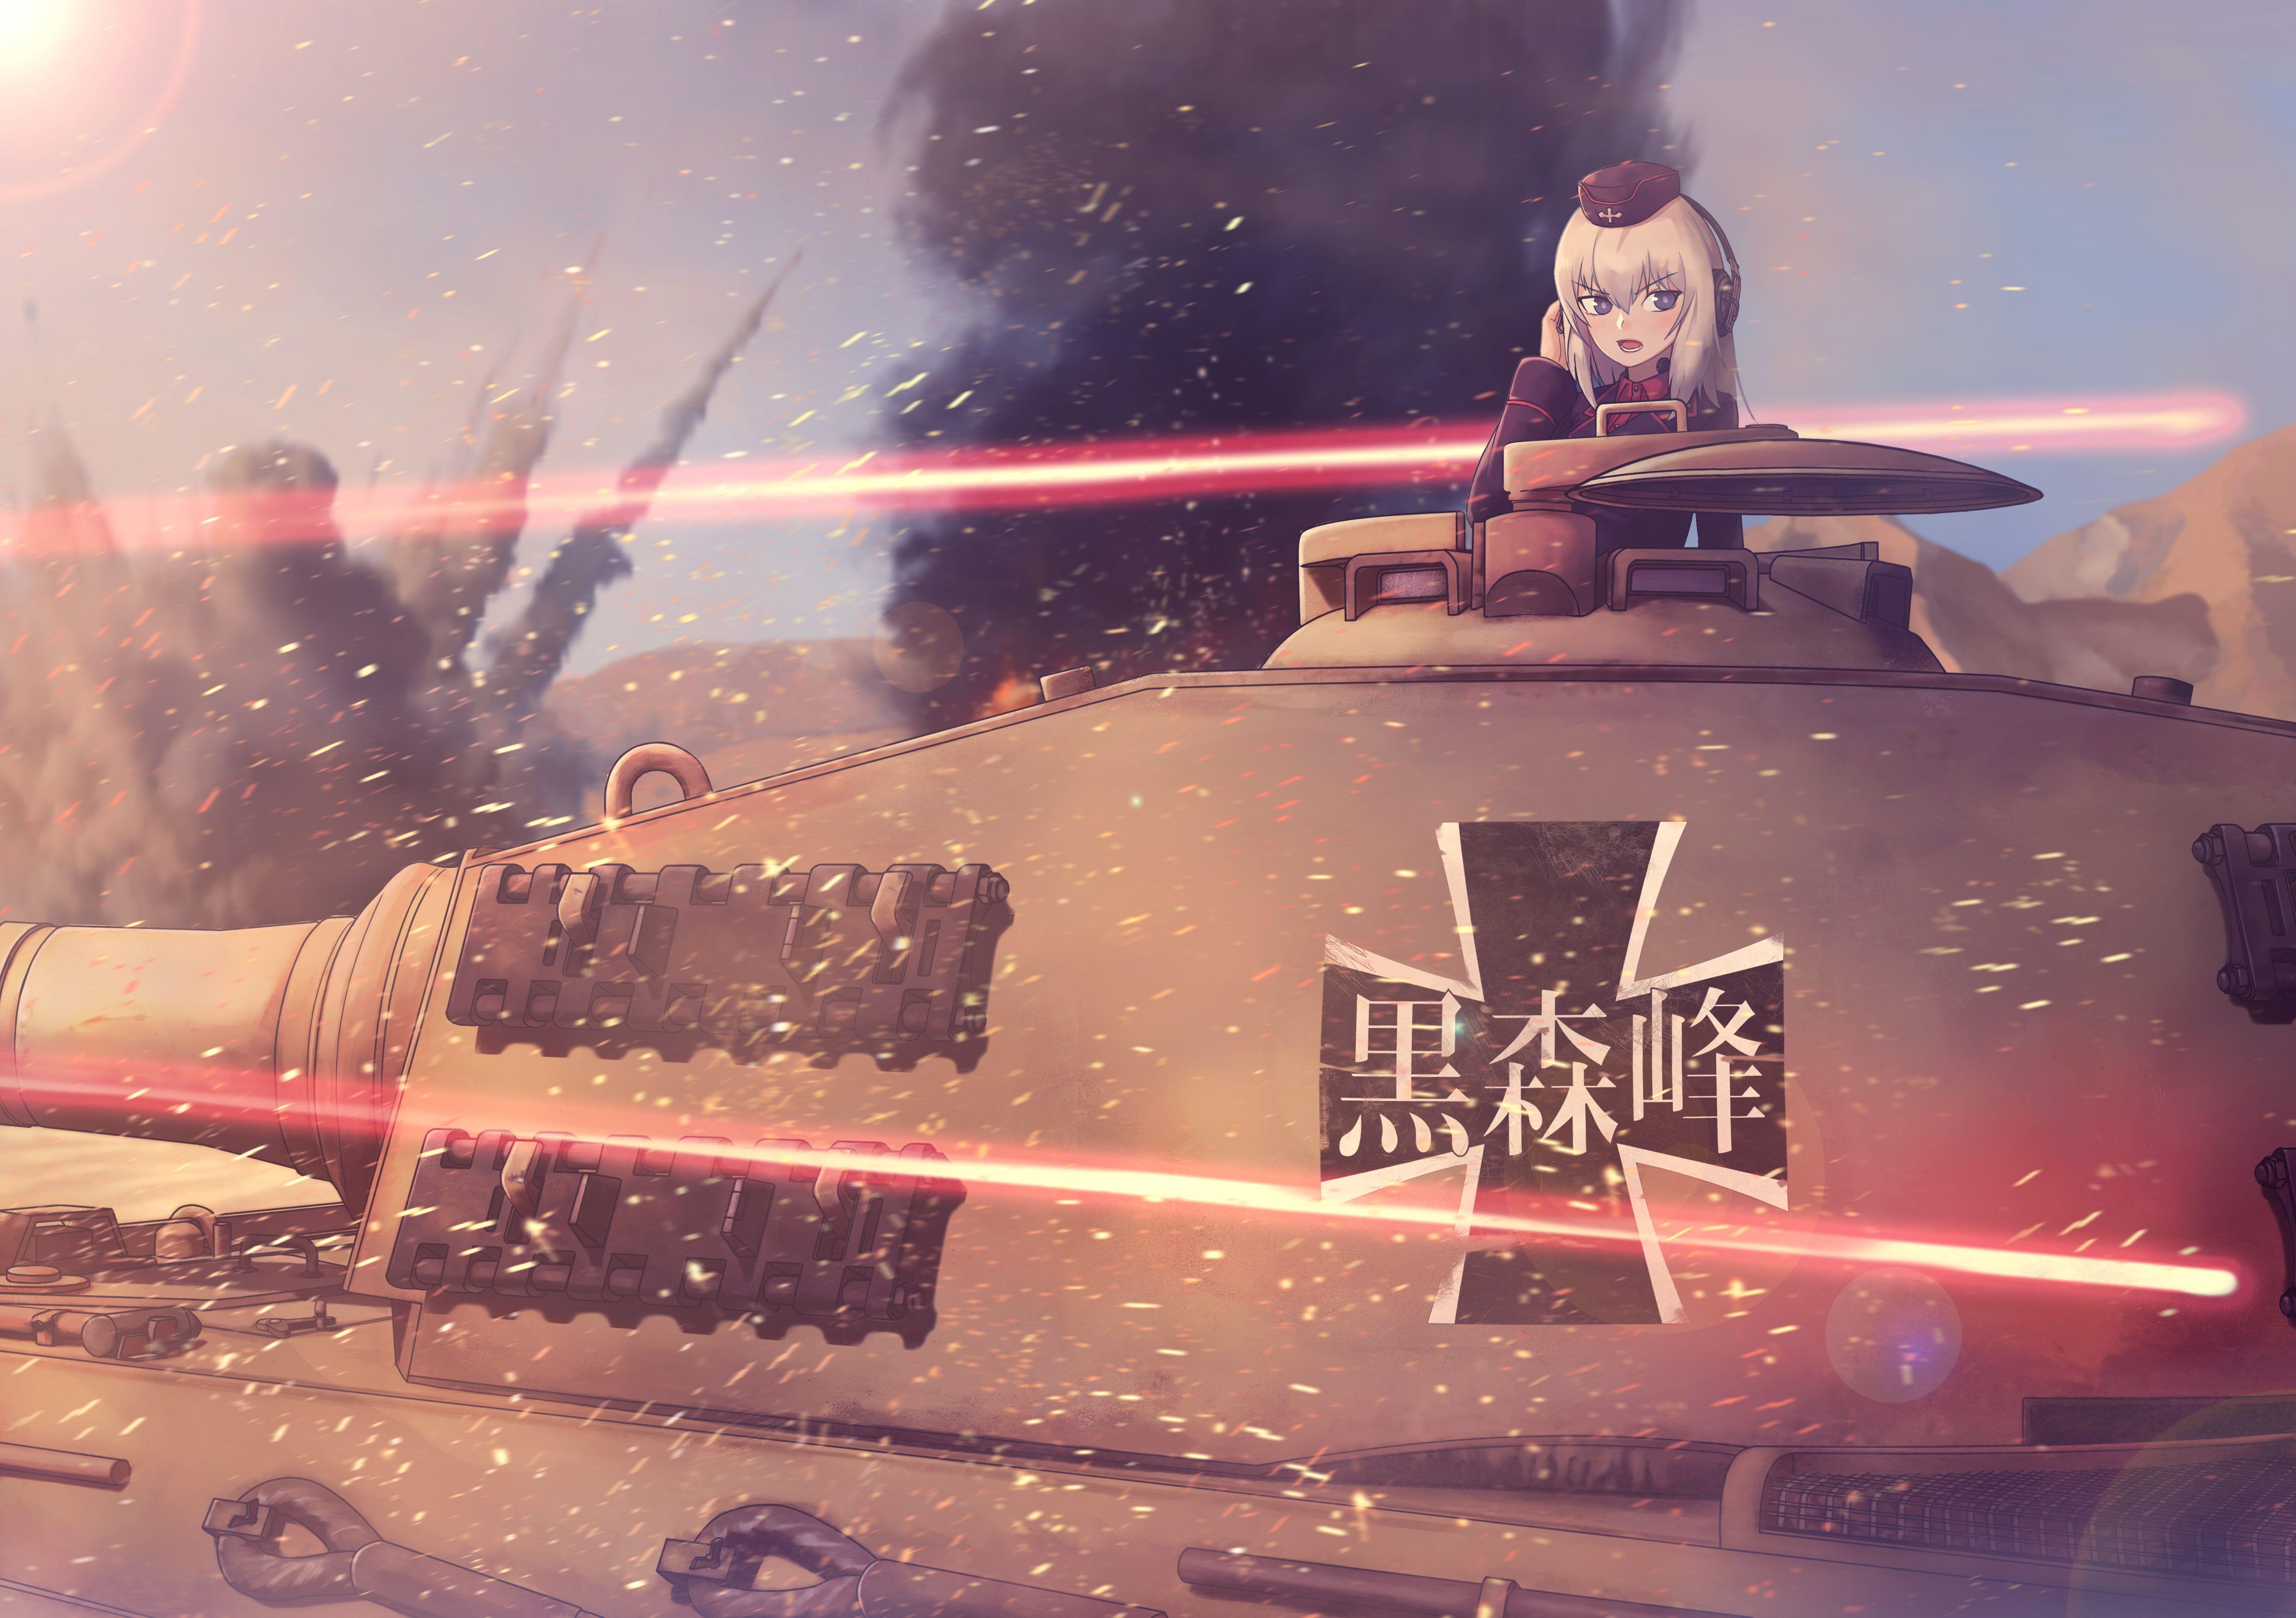 Anime Anime Girls Girls Und Panzer Itsumi Erika Tiger Ii 4k Wallpaper Hdwallpaper Desktop สาวอน เมะ ทหาร ศ ลปะอะน เมะ